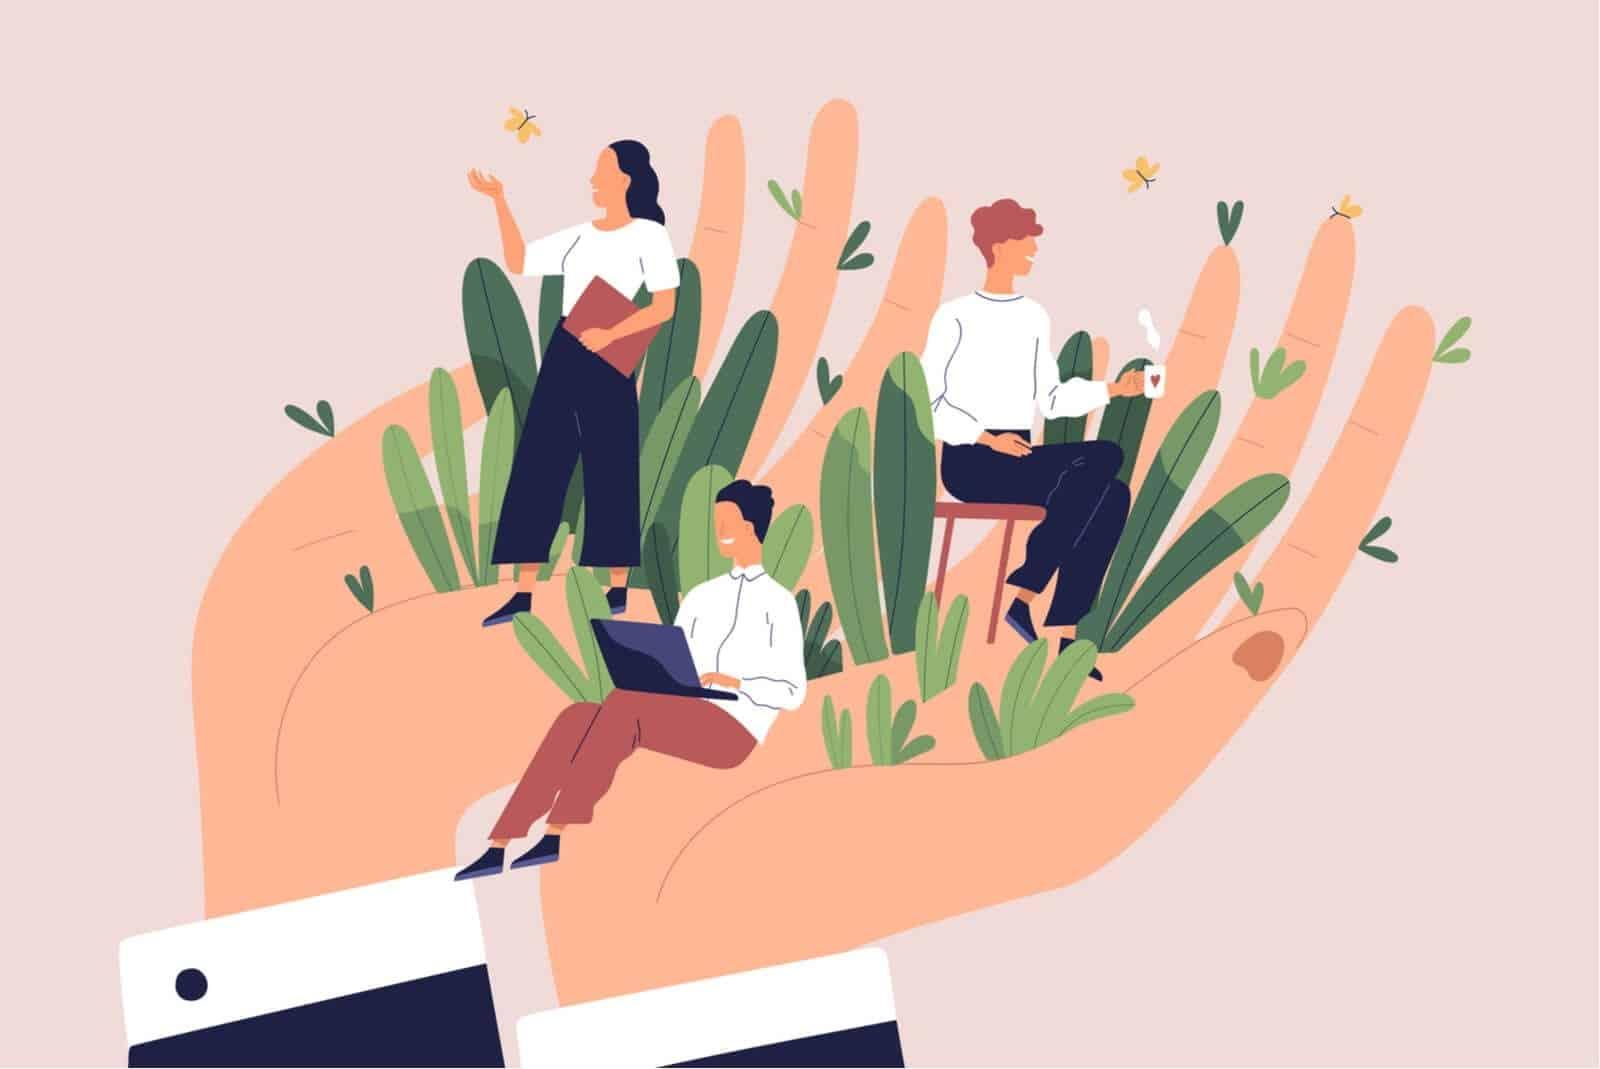 Manfaat Absensi Online untuk Perusahaan